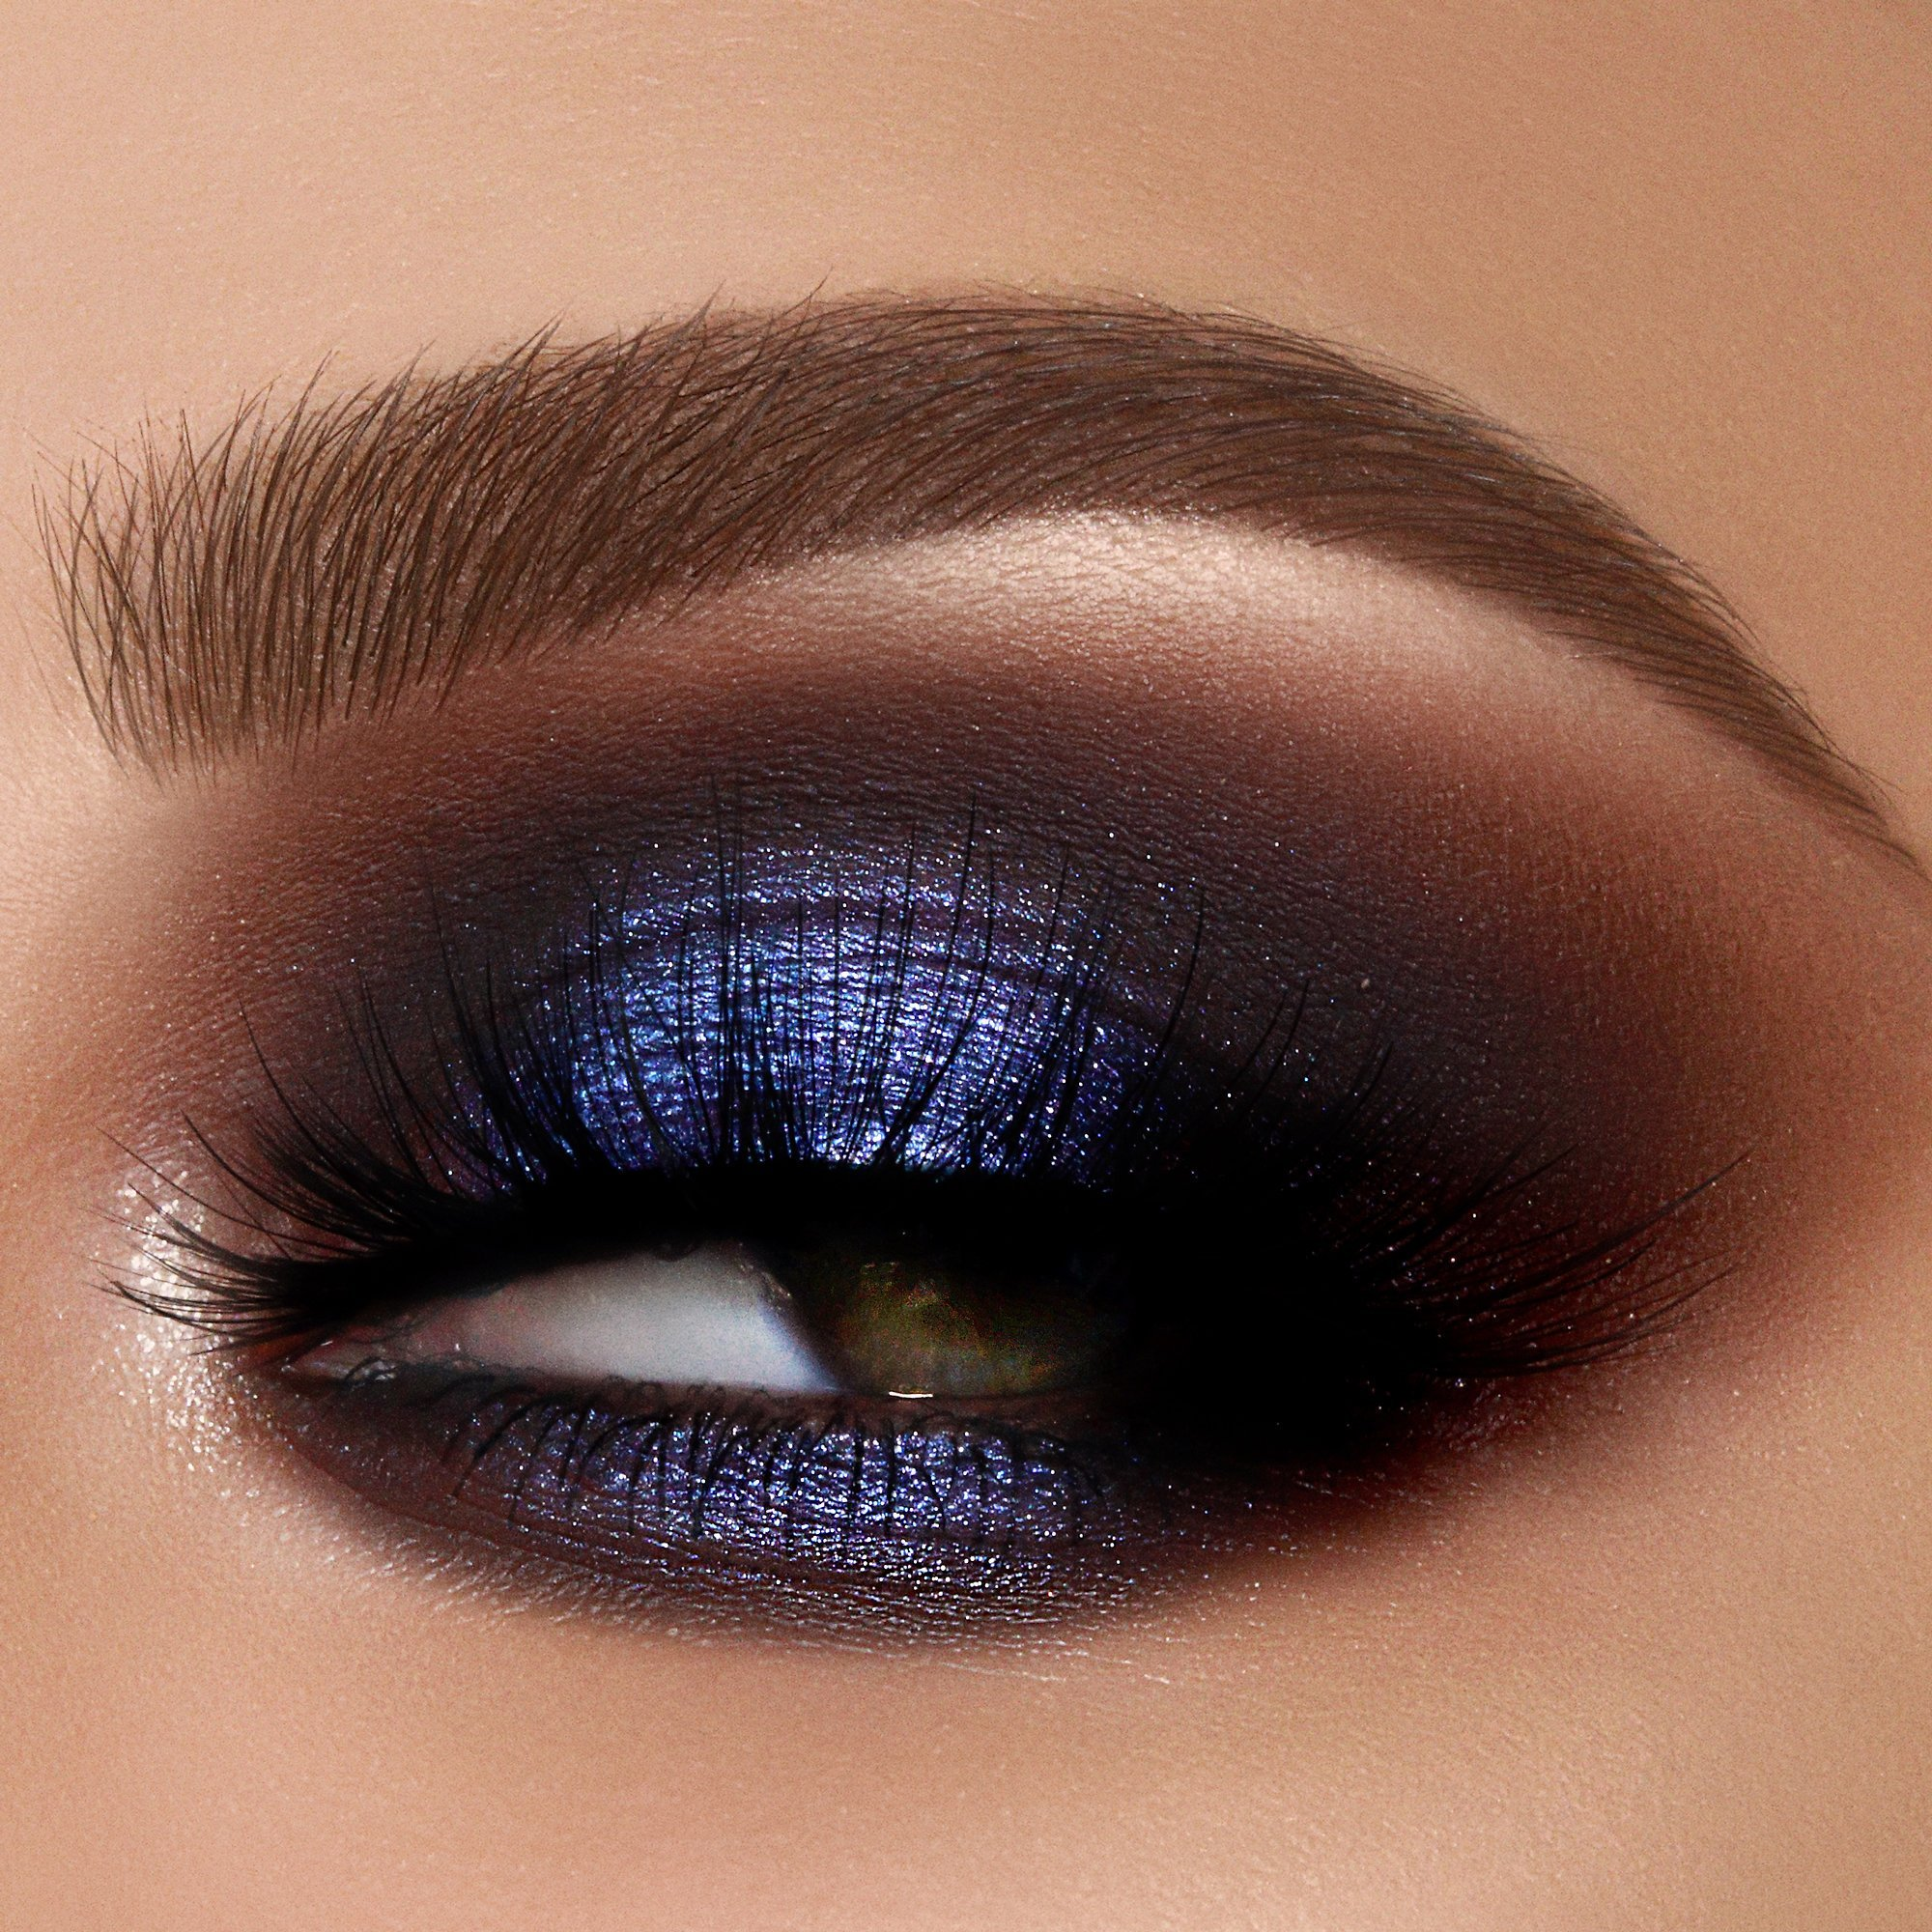 PAT MCGRATH LABS Mothership VI Eyeshadow Palette - Midnight Sun